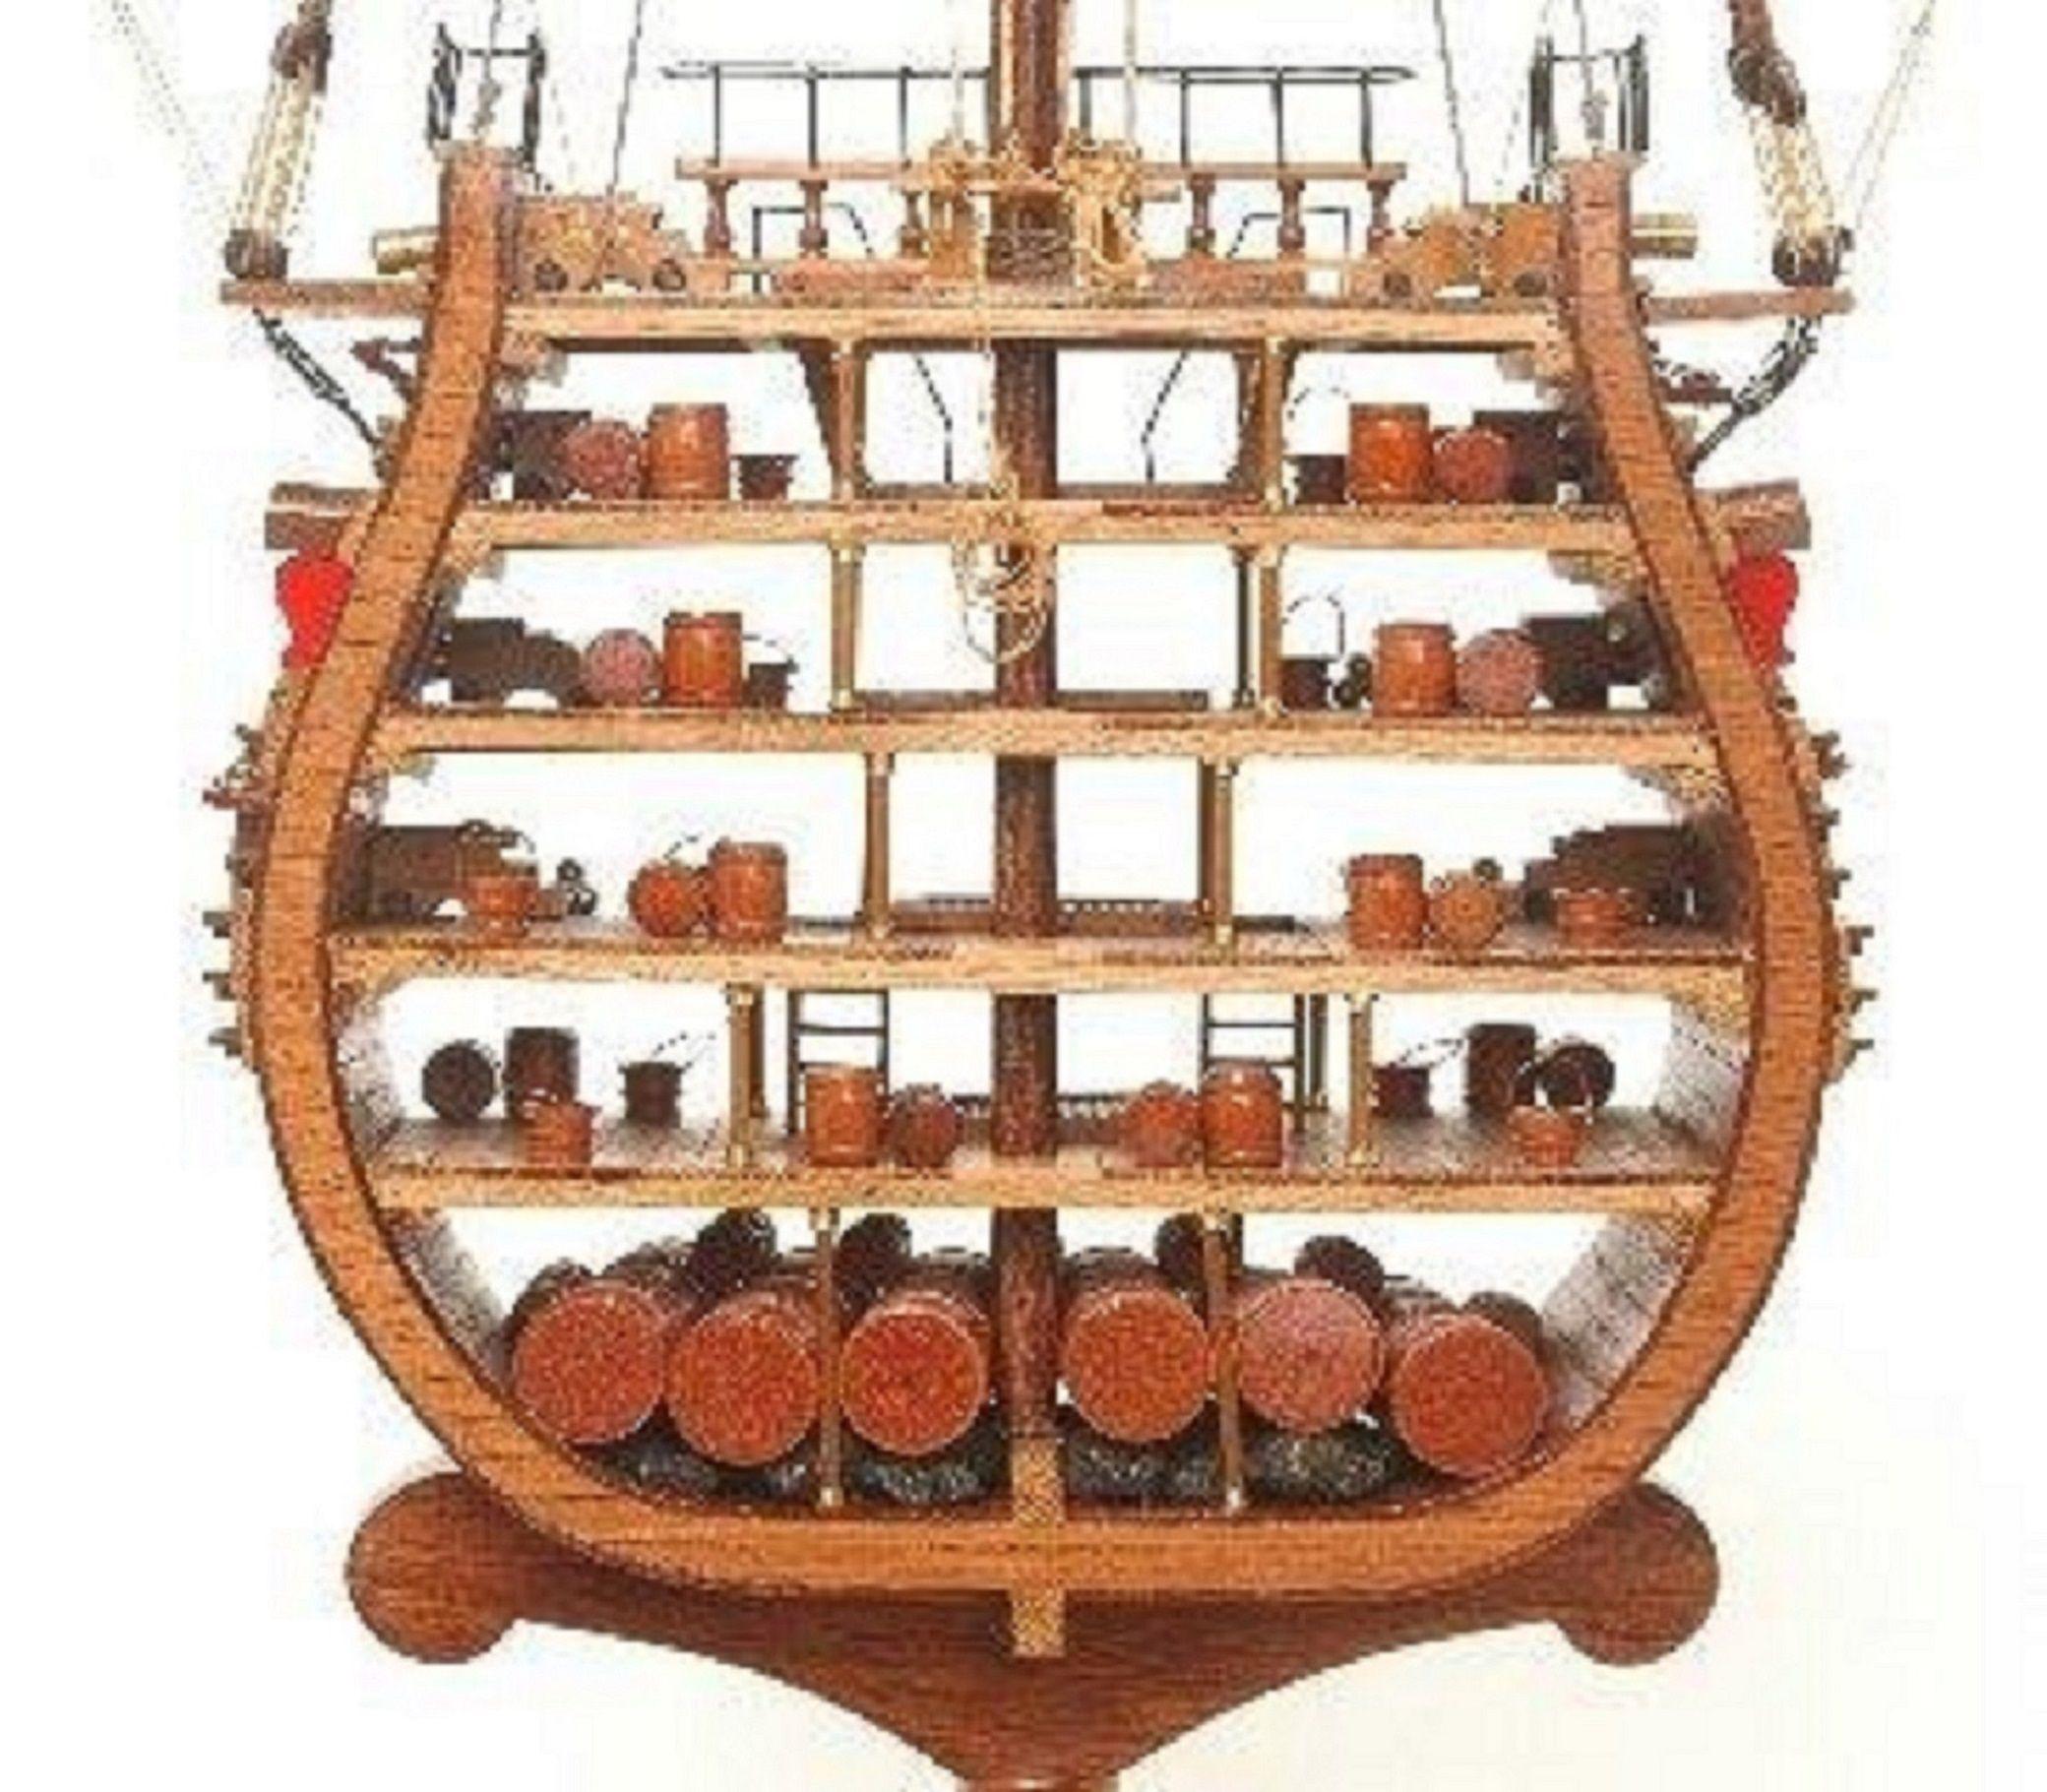 330-7450-HMS-Victory-Cross-Section-Model-Ship-Premier-Range